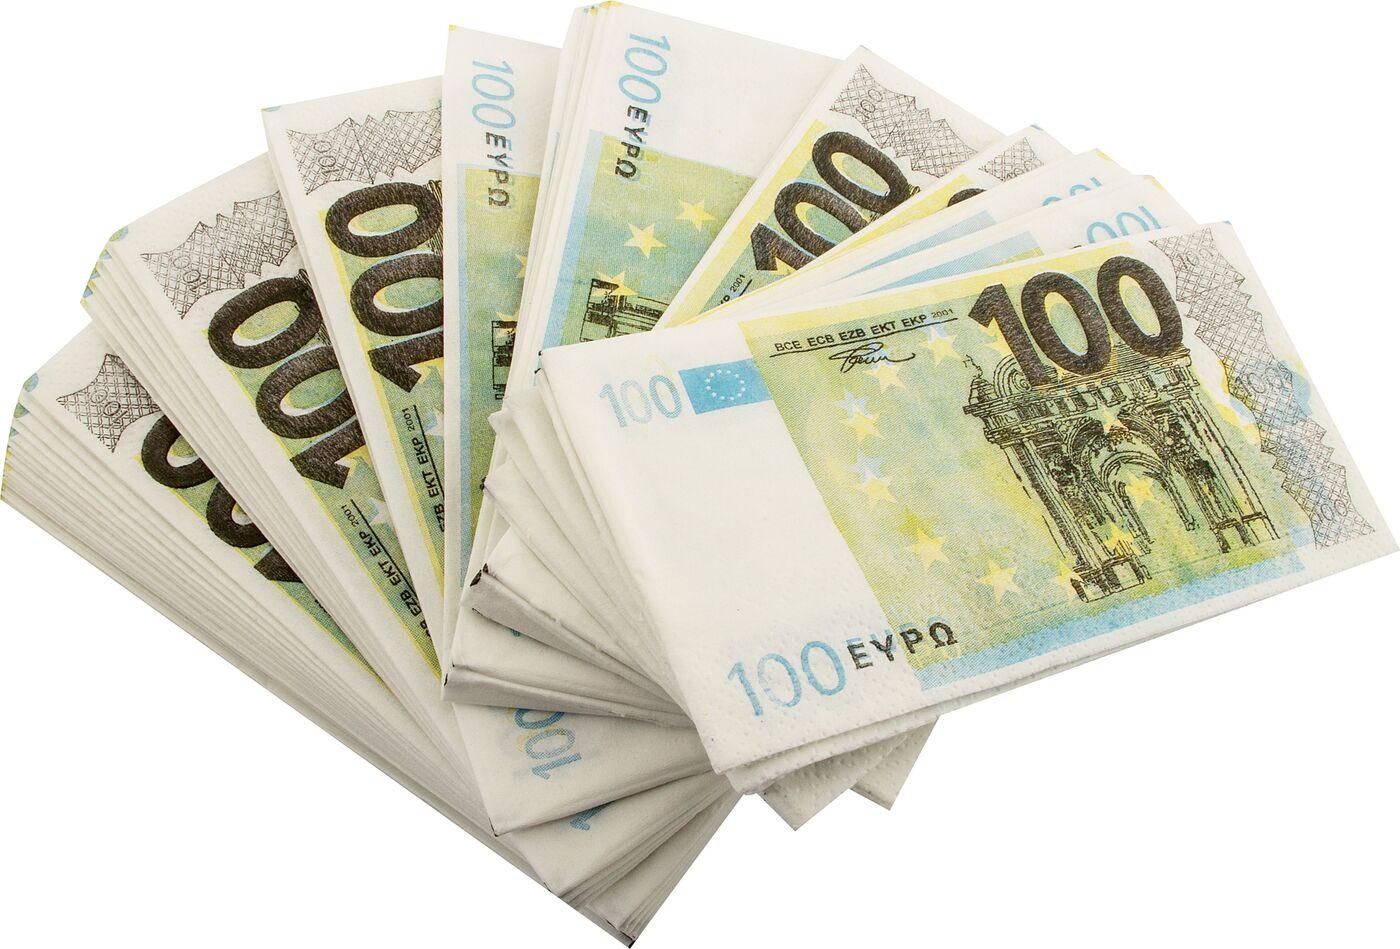 Салфетки Пачка 100 евро салфетки пачка 100 евро